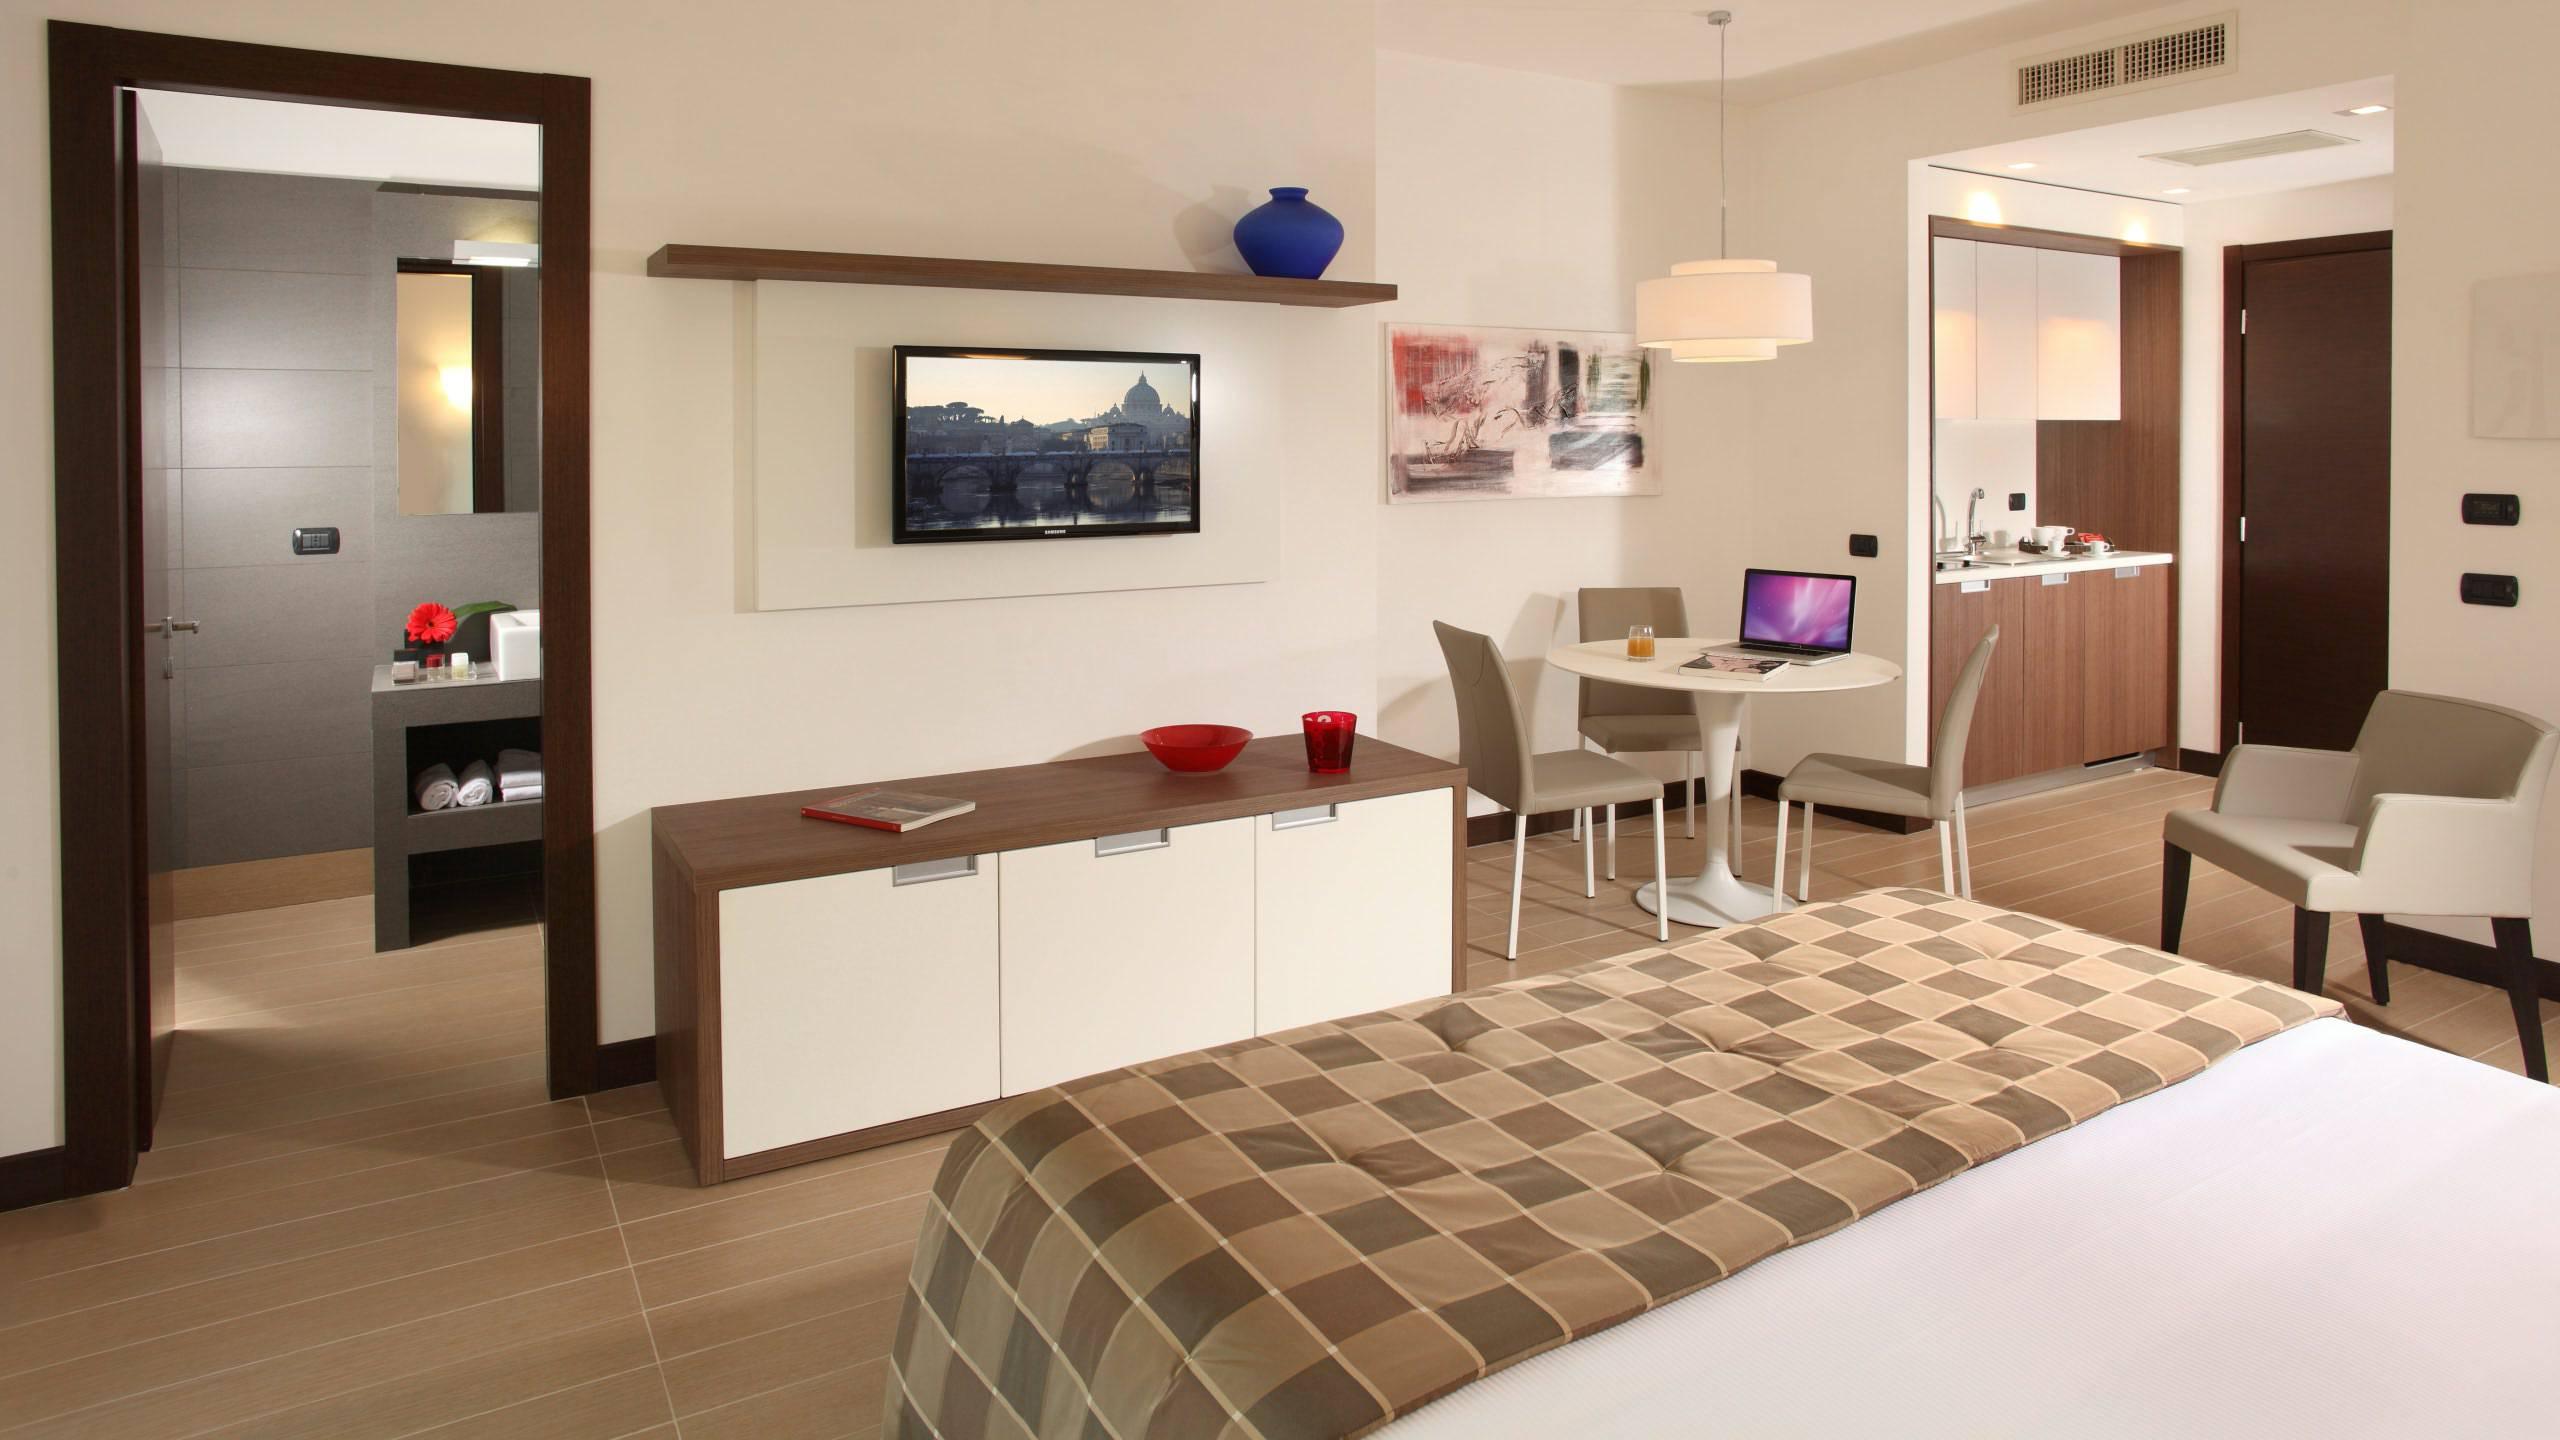 Residence hotel parioli roma camera deluxe for Camera roma